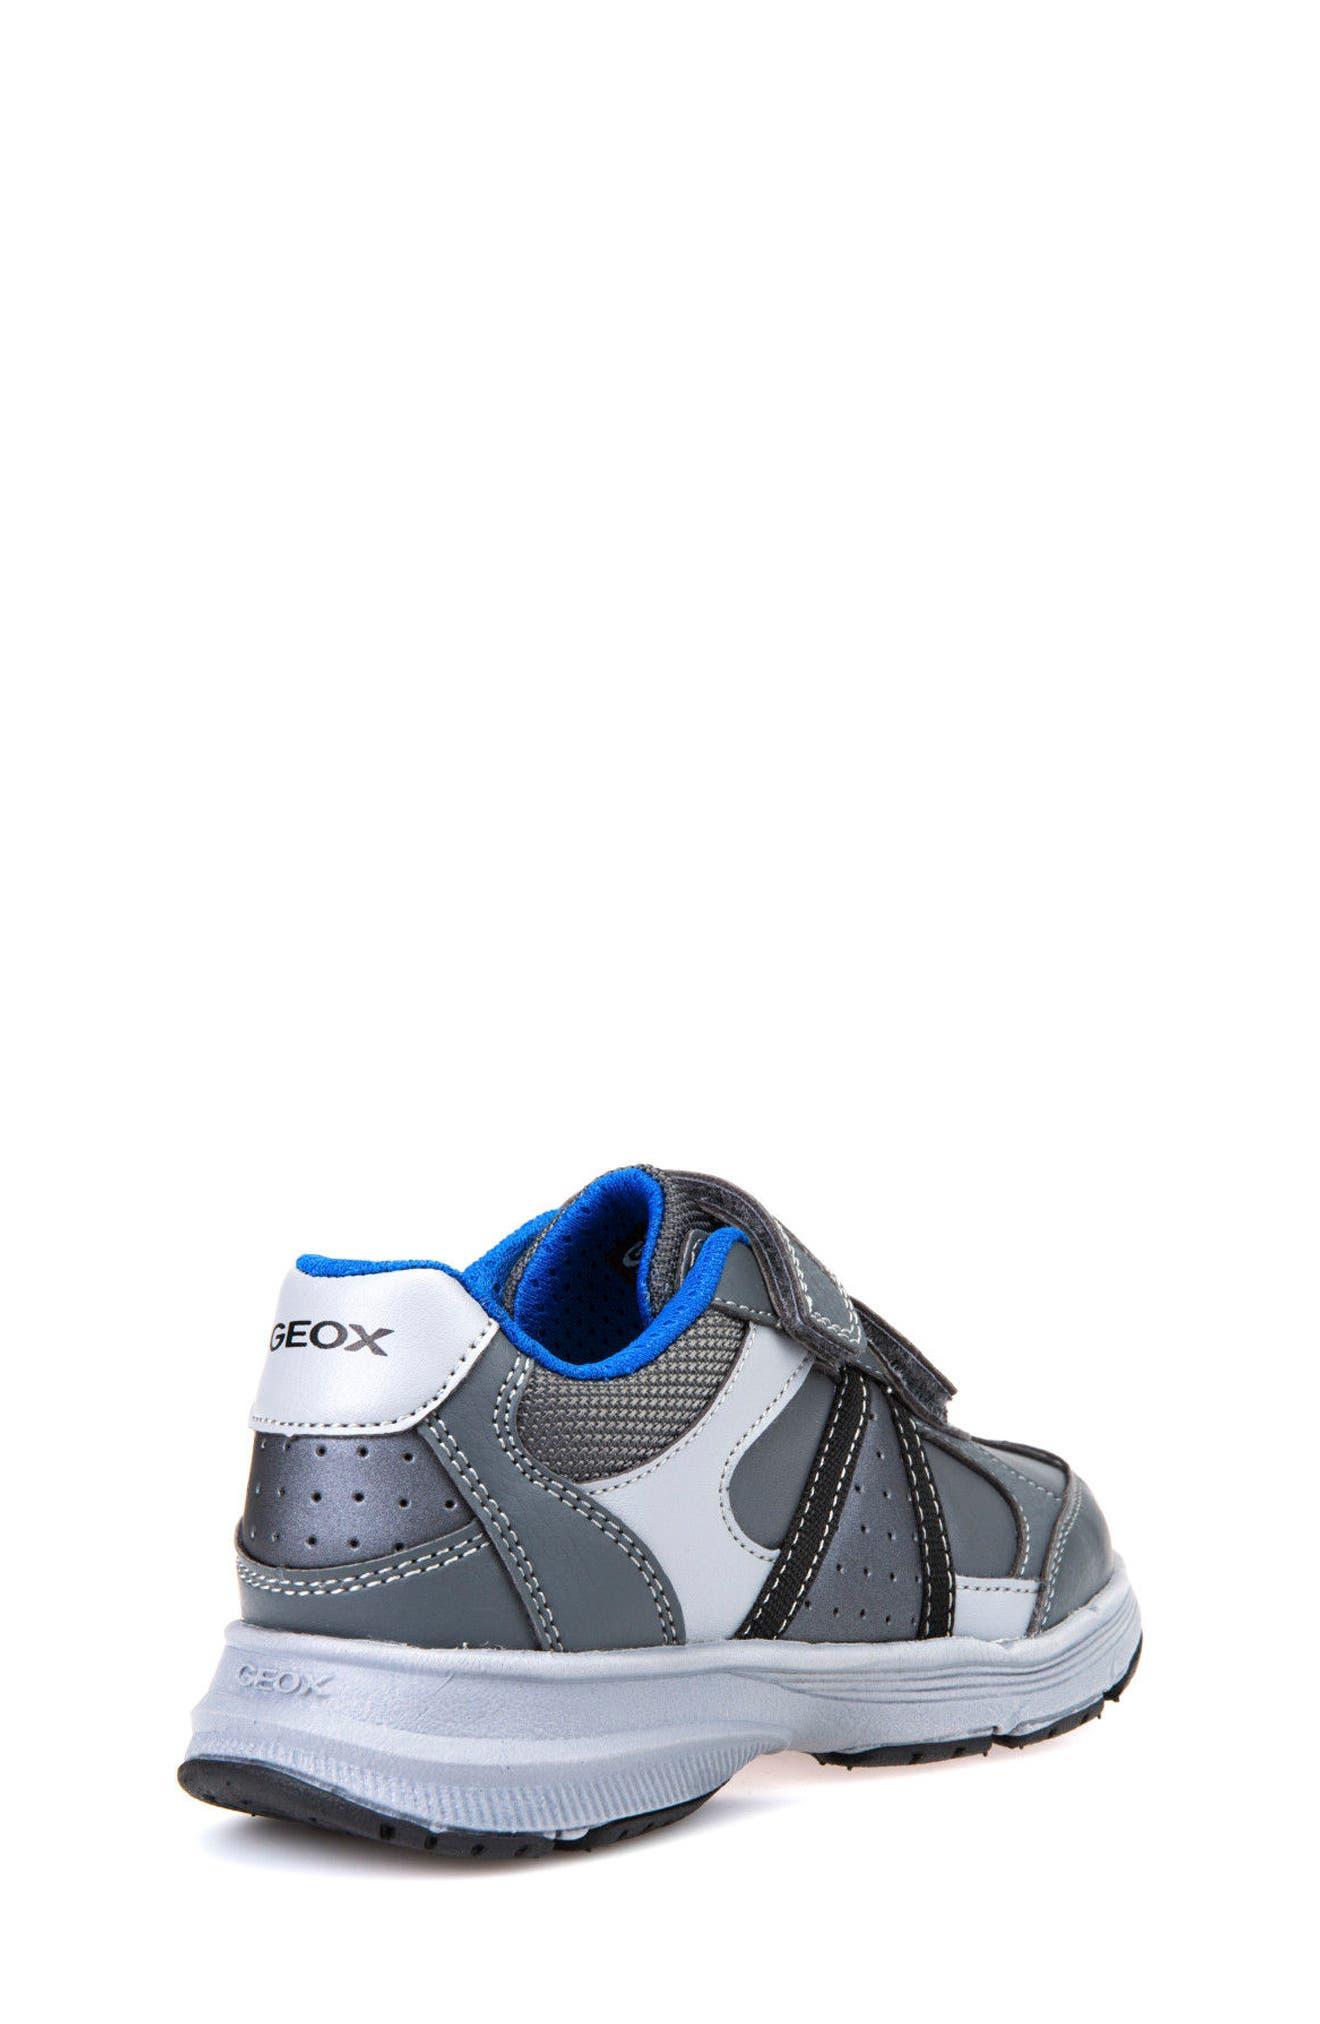 Top Fly Sneaker,                             Alternate thumbnail 4, color,